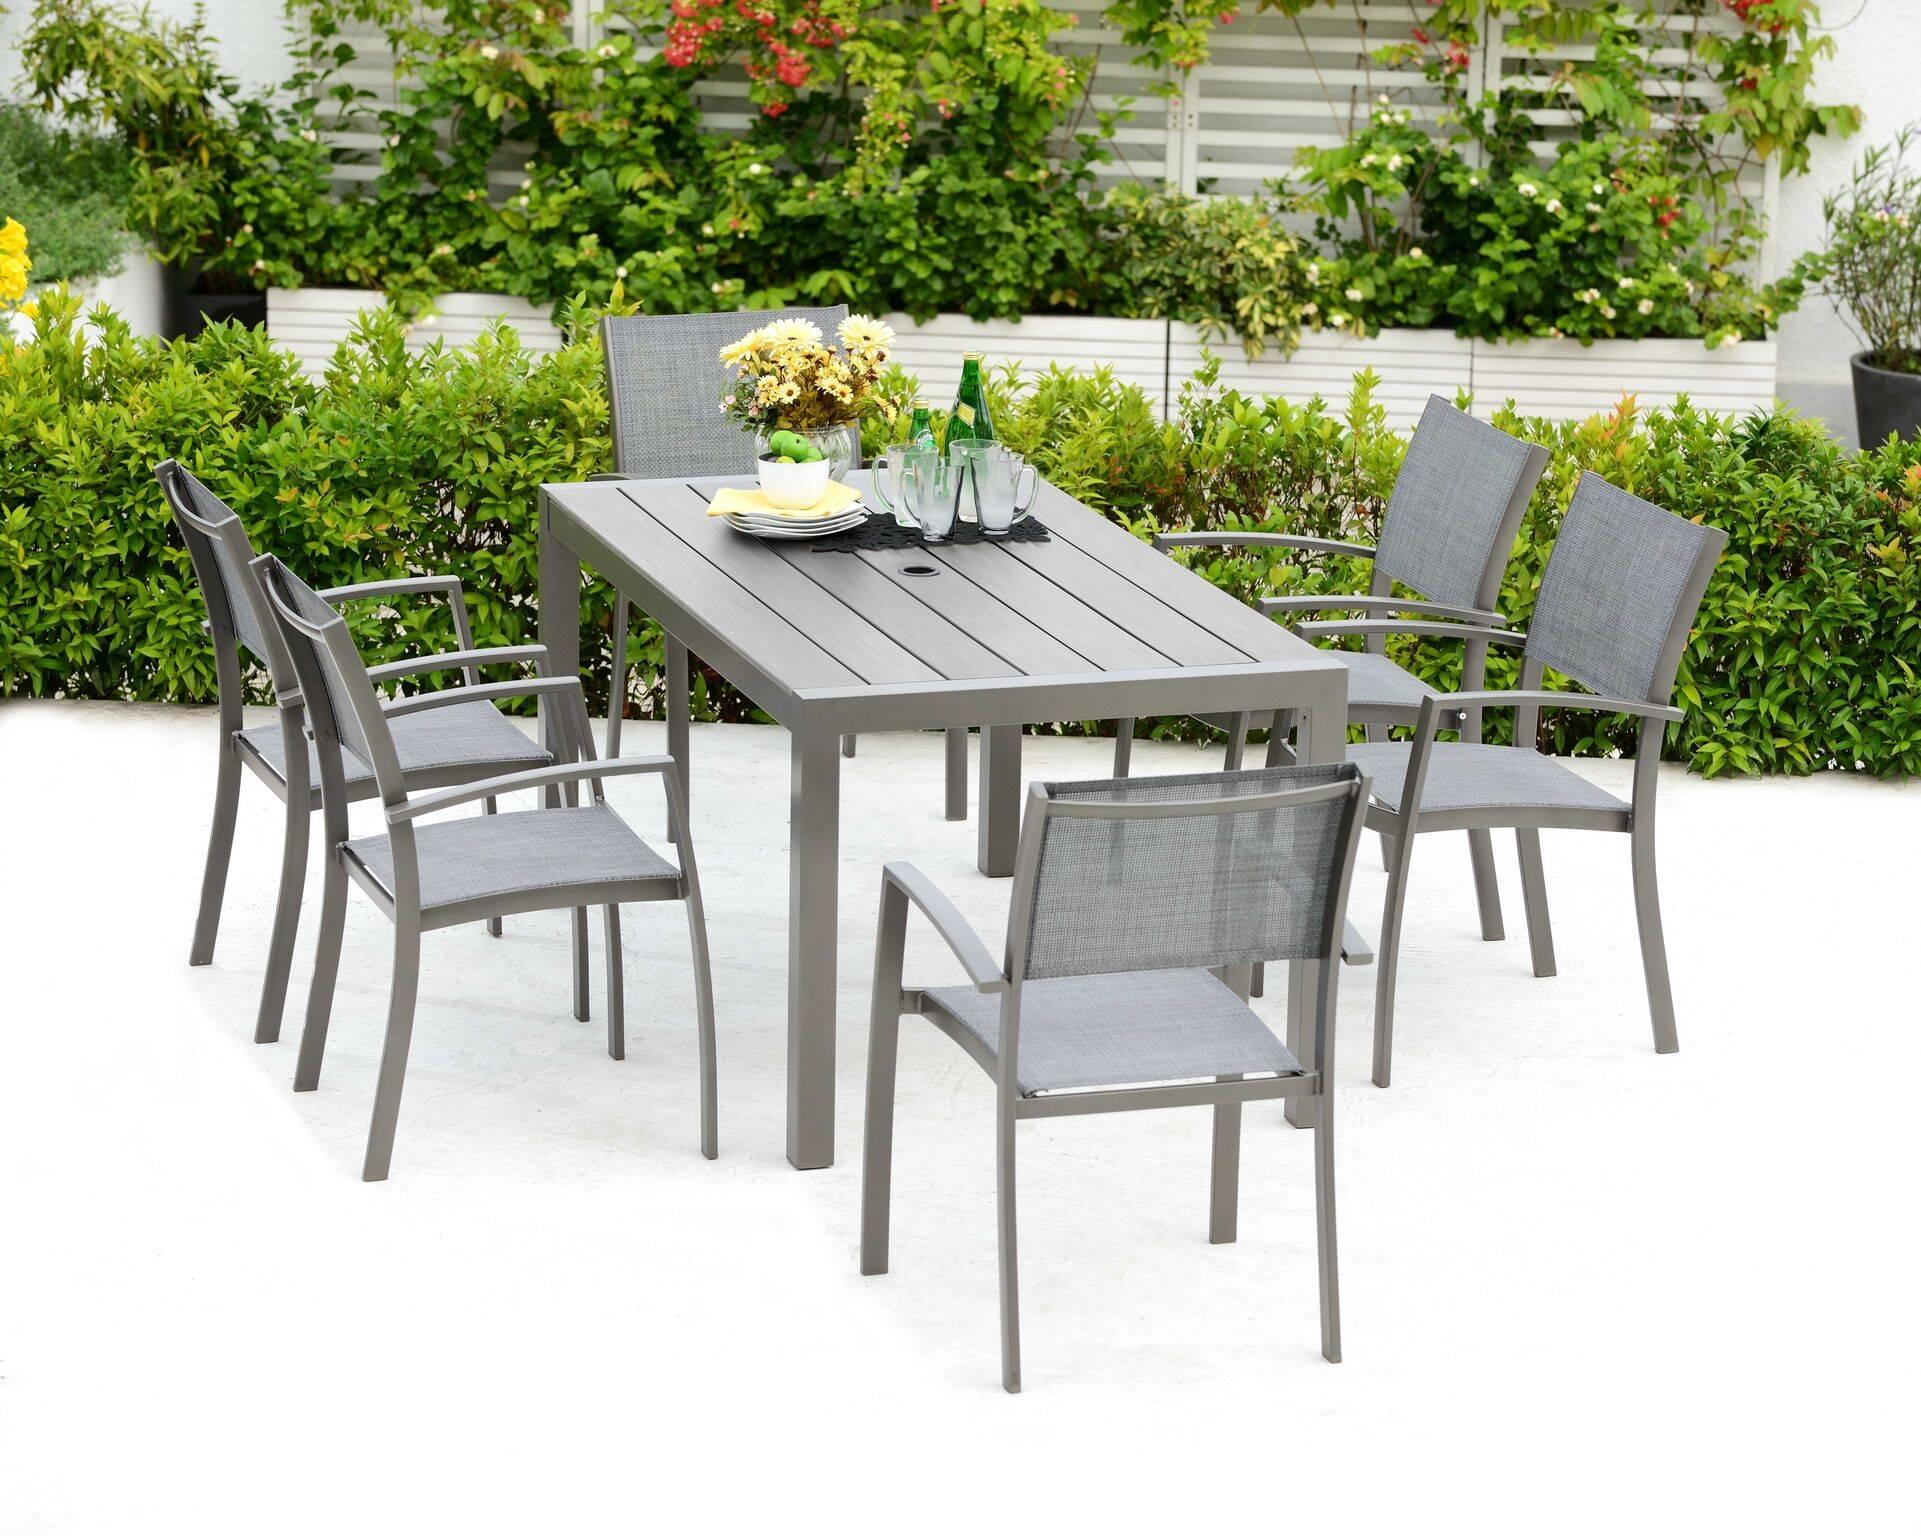 Solana 6 Seater Rectangular Garden Dining Set Oldrids